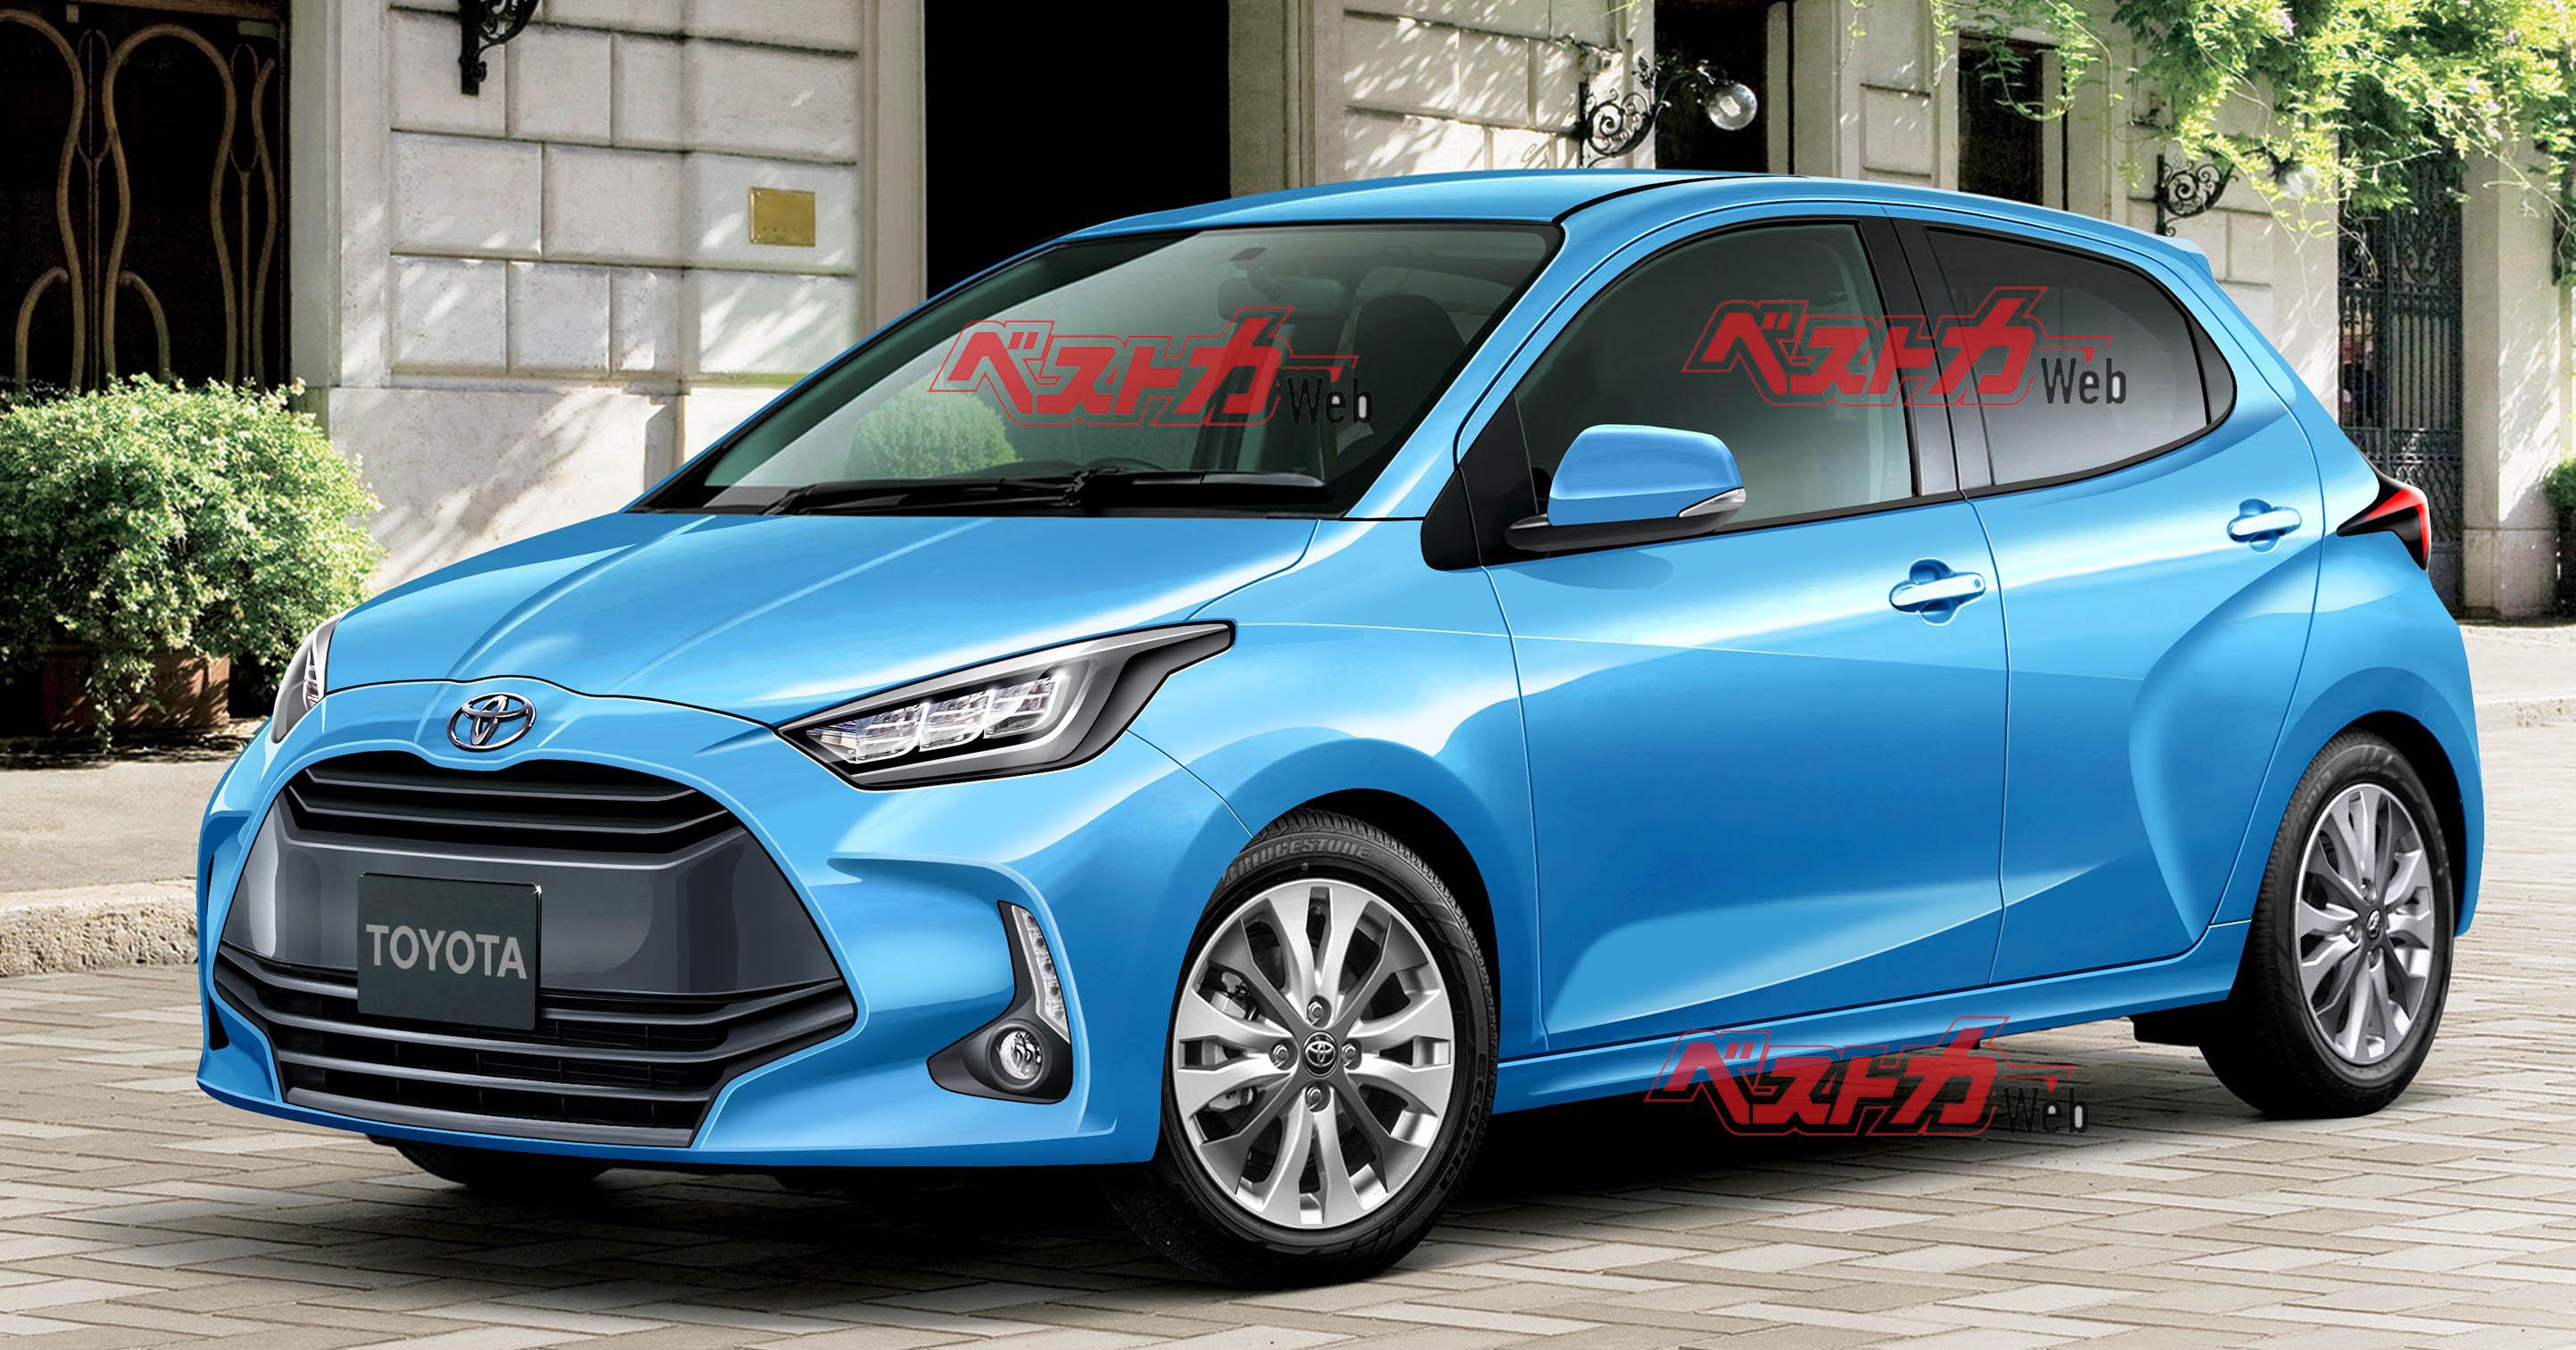 2020 - [Toyota] Yaris - Page 3 709273c4ff70e289712c07b759bb3f9c.jpg?_ga=2.21555325.736604115.1564744046-1923100404